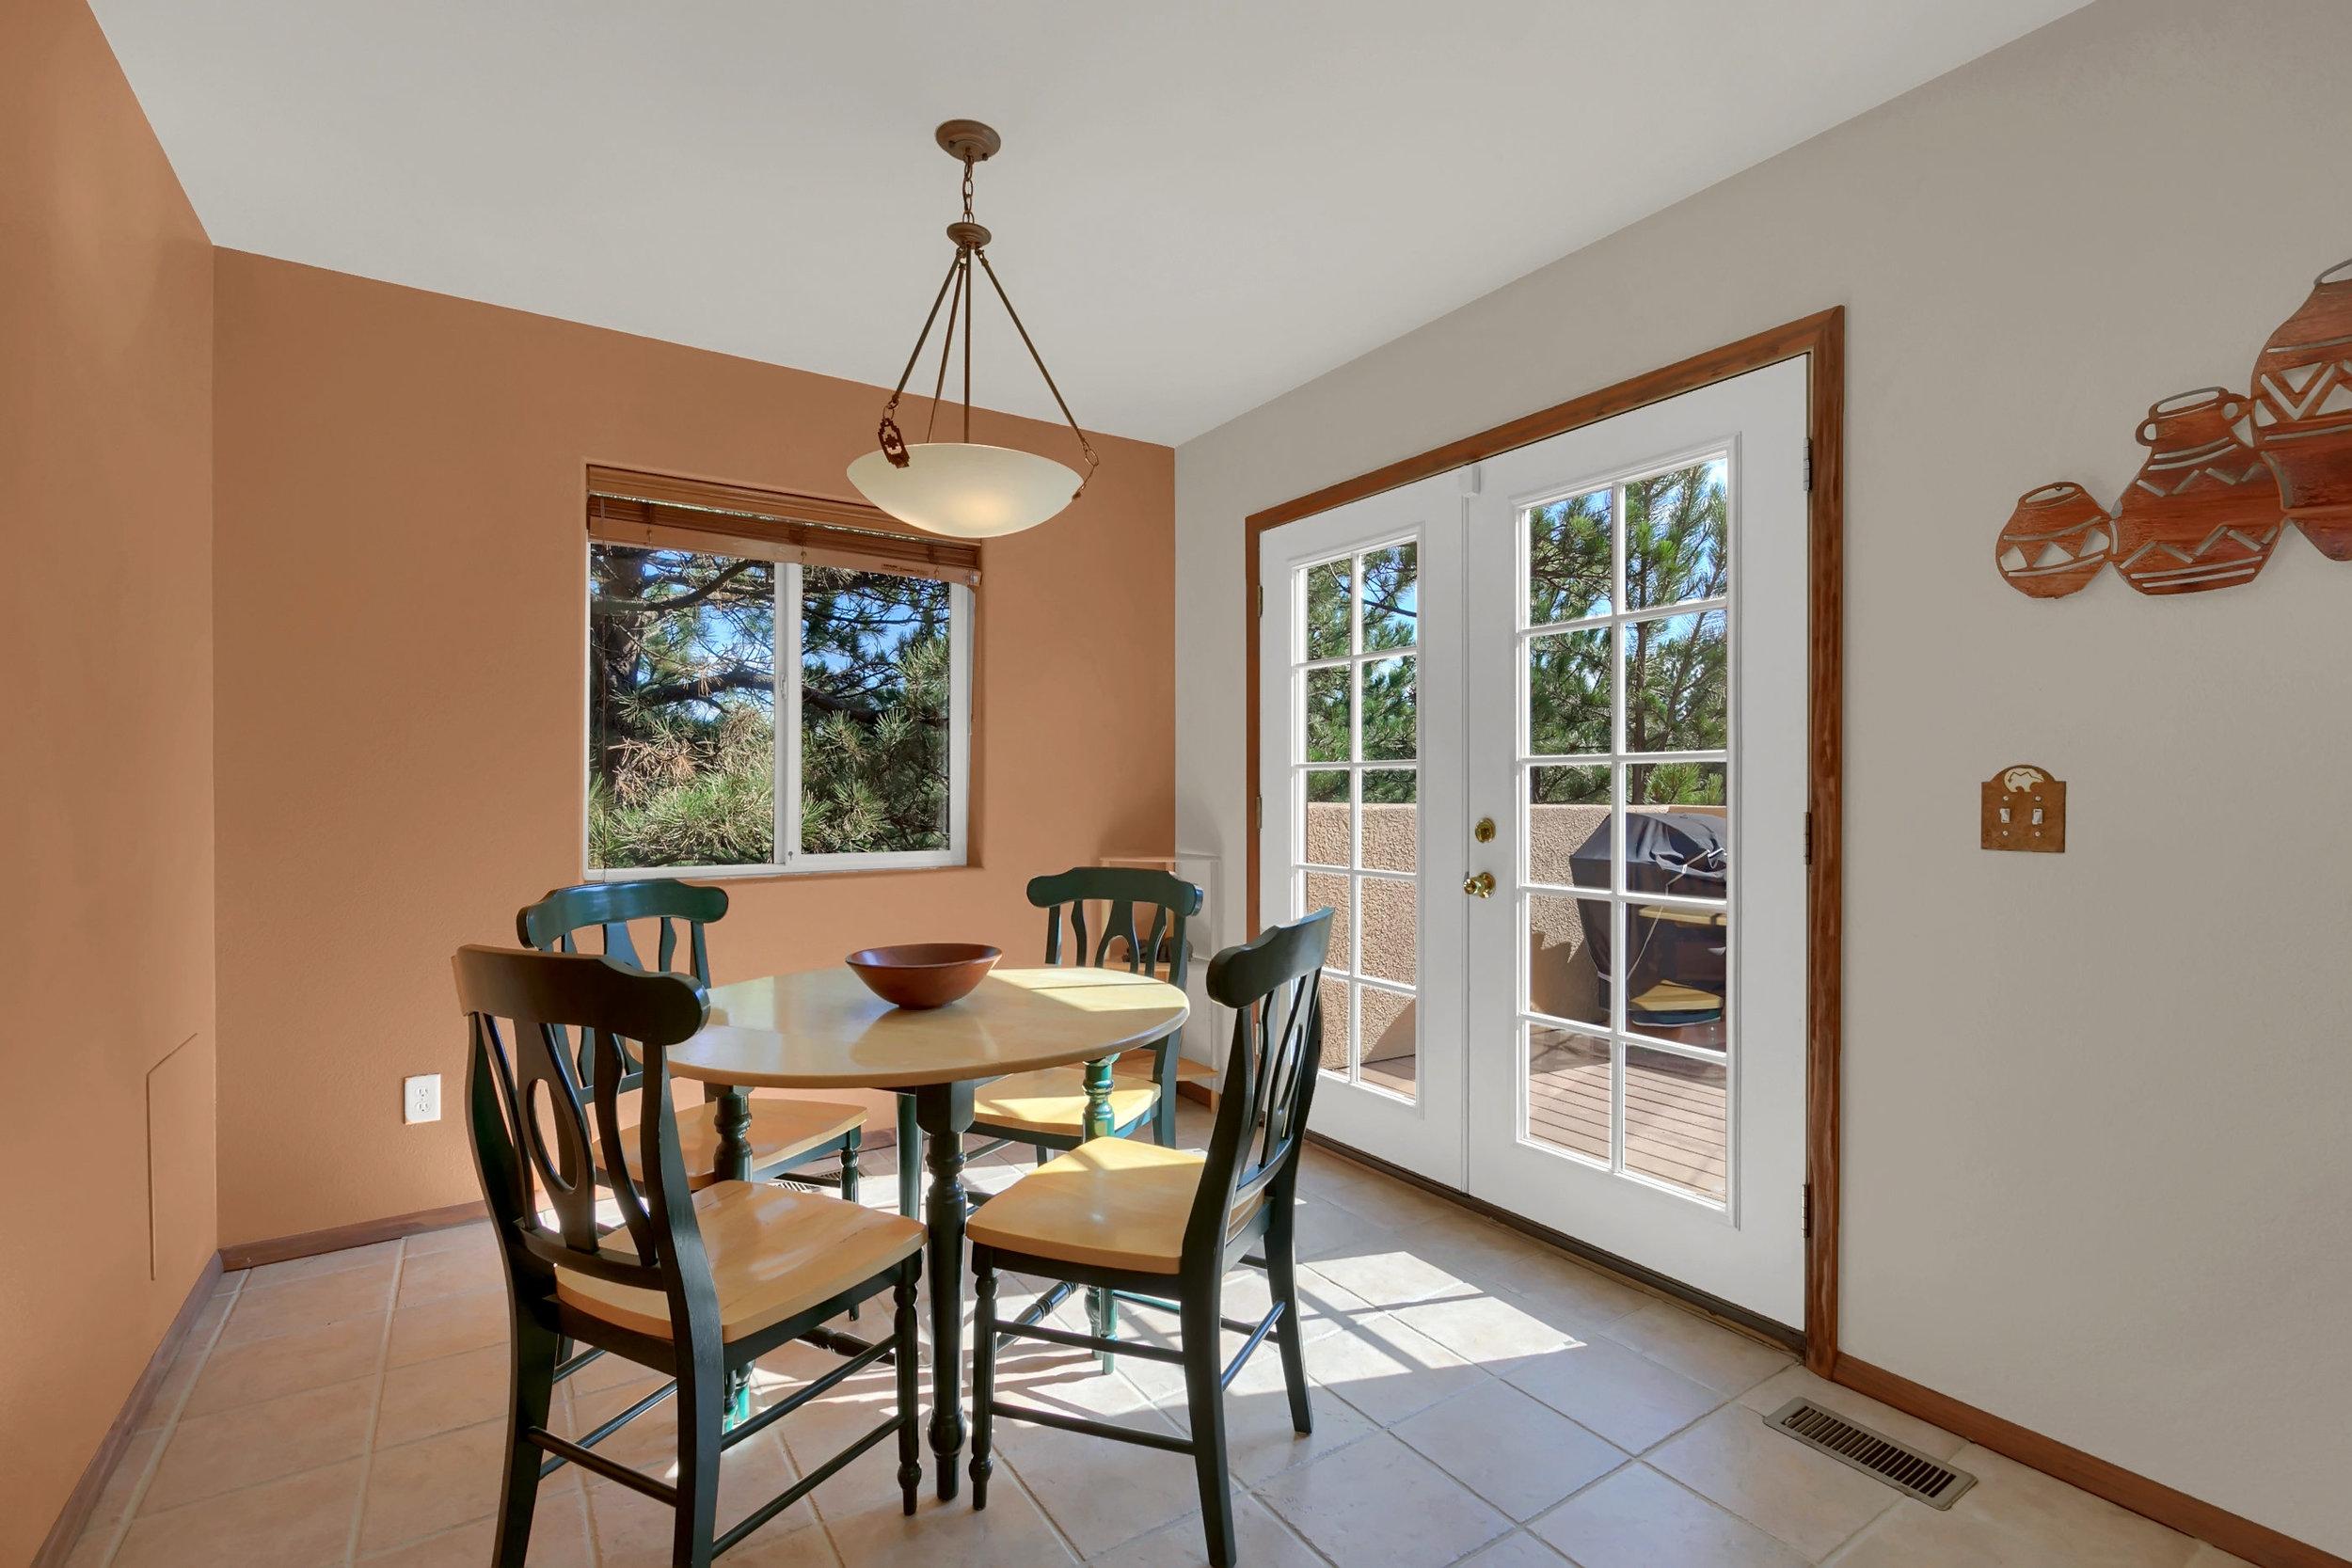 1605 Vickers Drive Colorado-print-015-013-Dining Room-2800x1867-300dpi.jpg